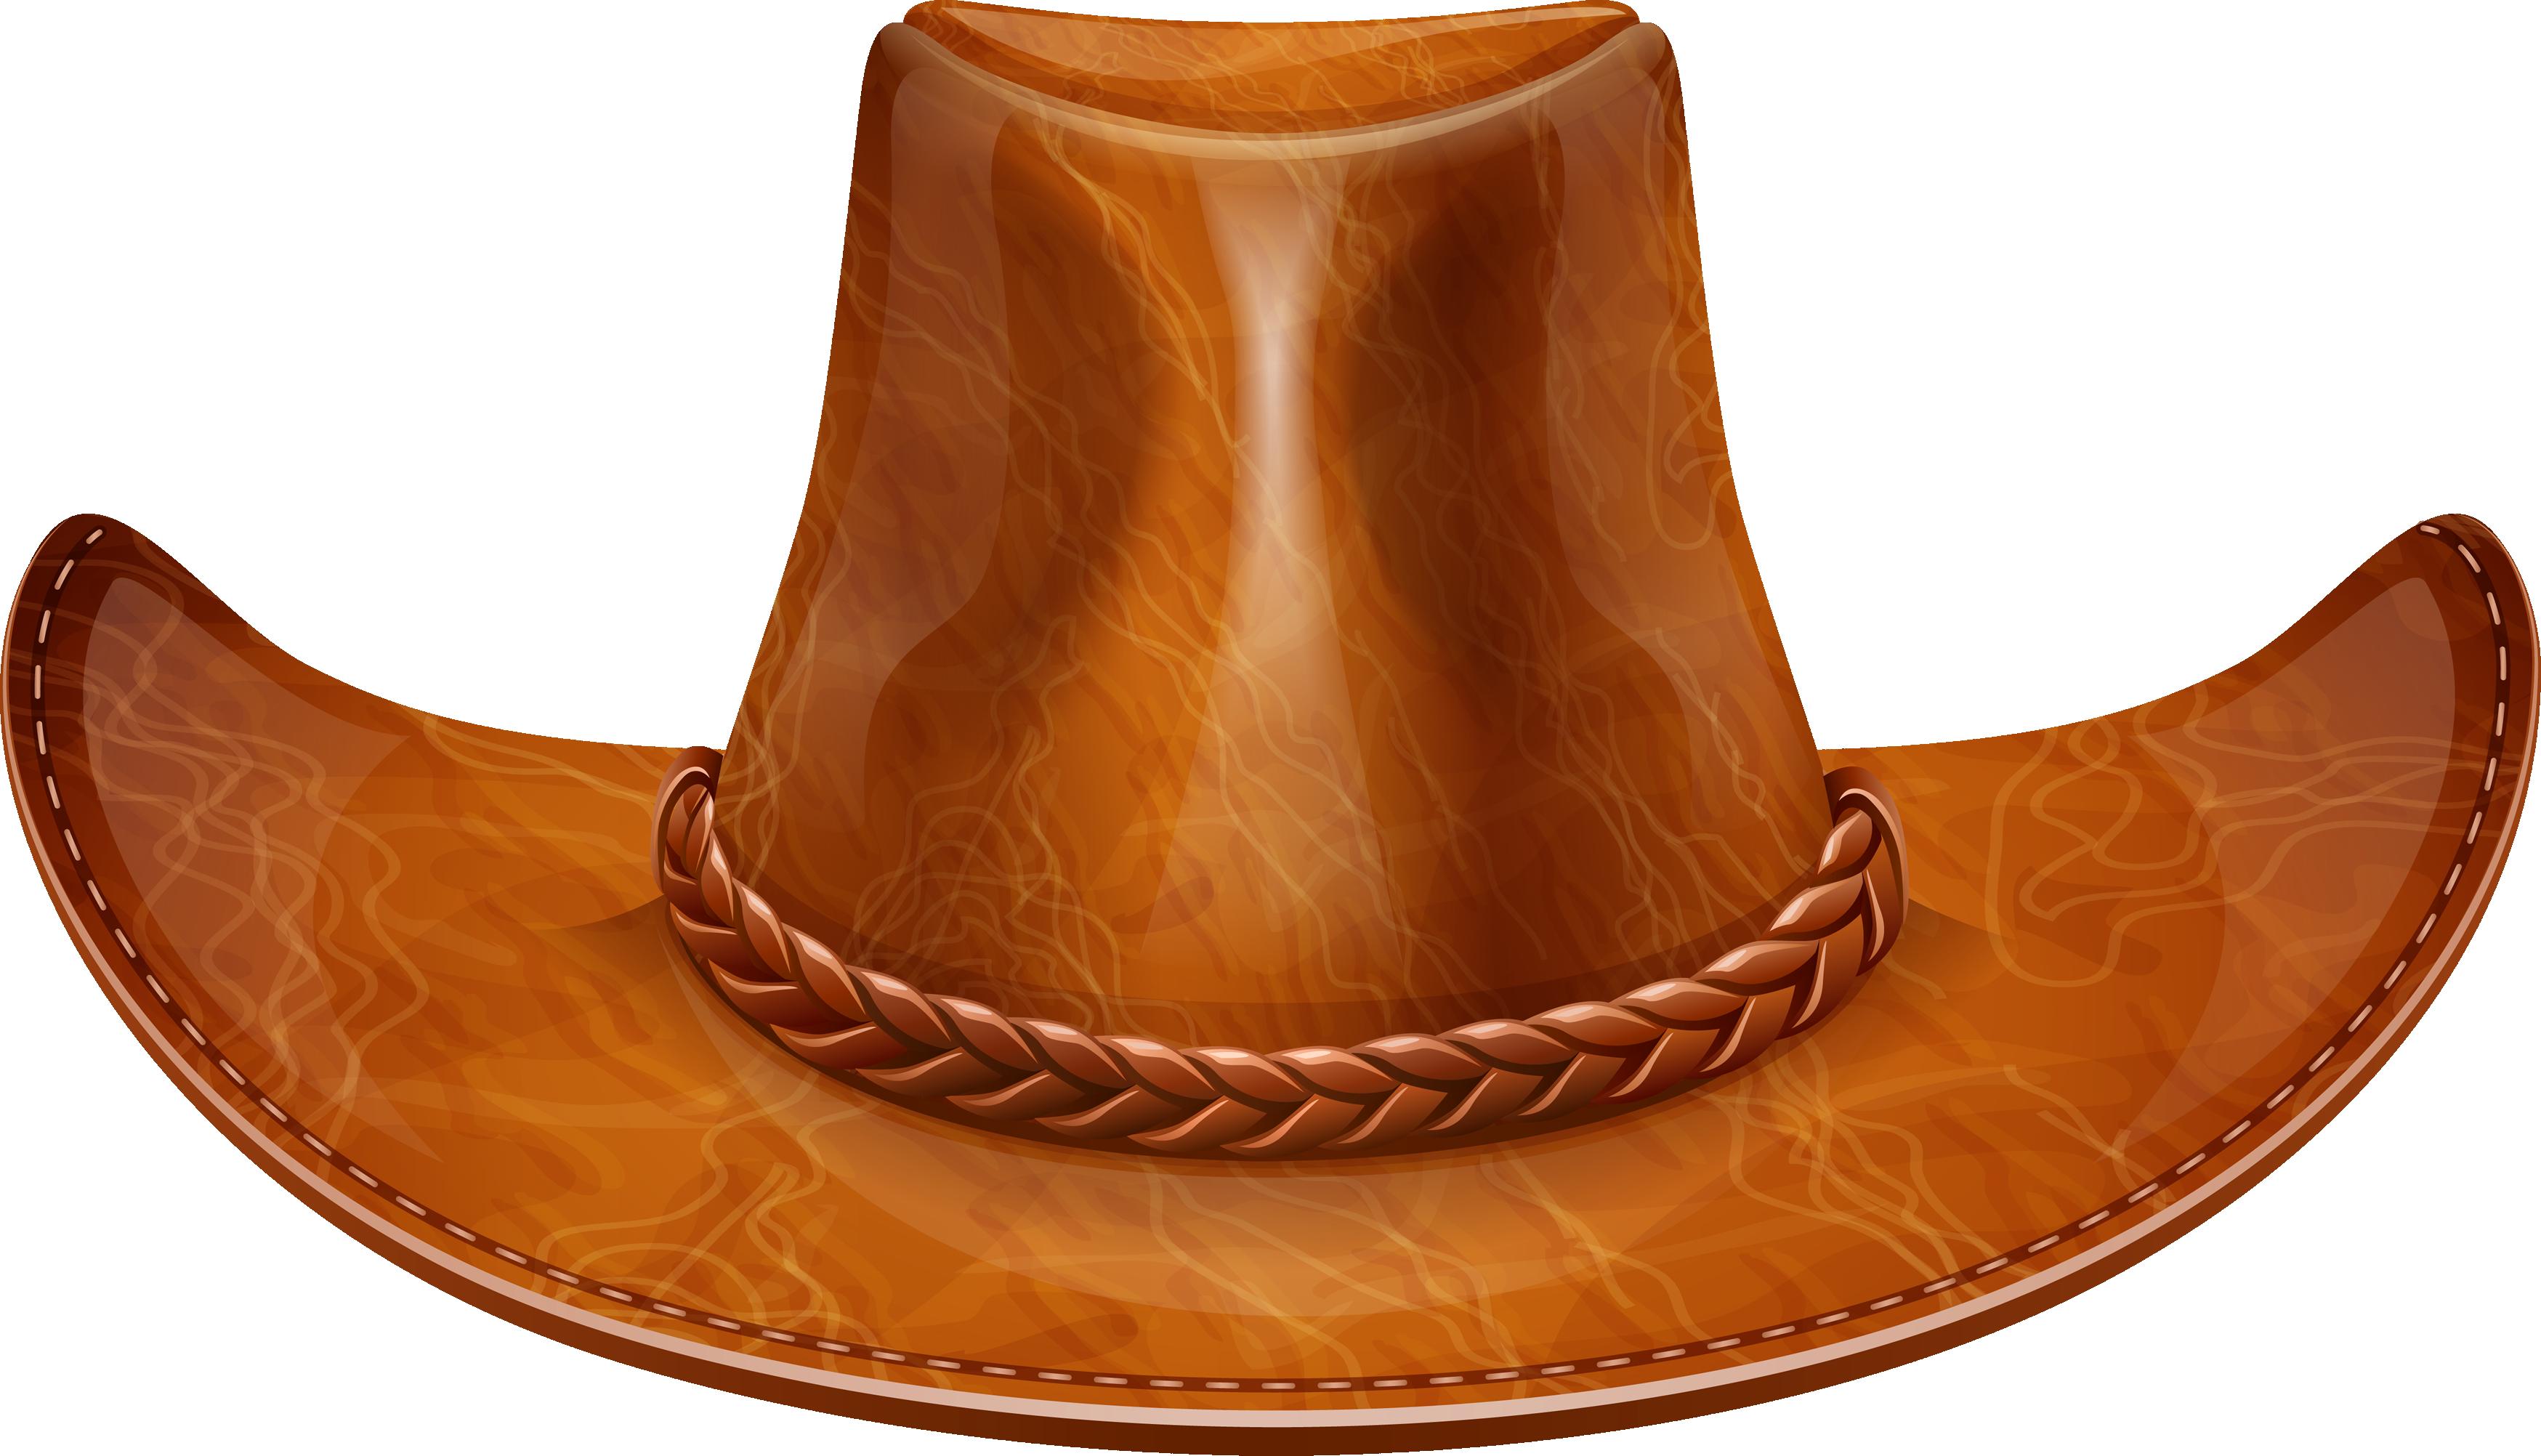 Free Cowboy Hat Png, Download Free Clip Art, Free Clip Art.